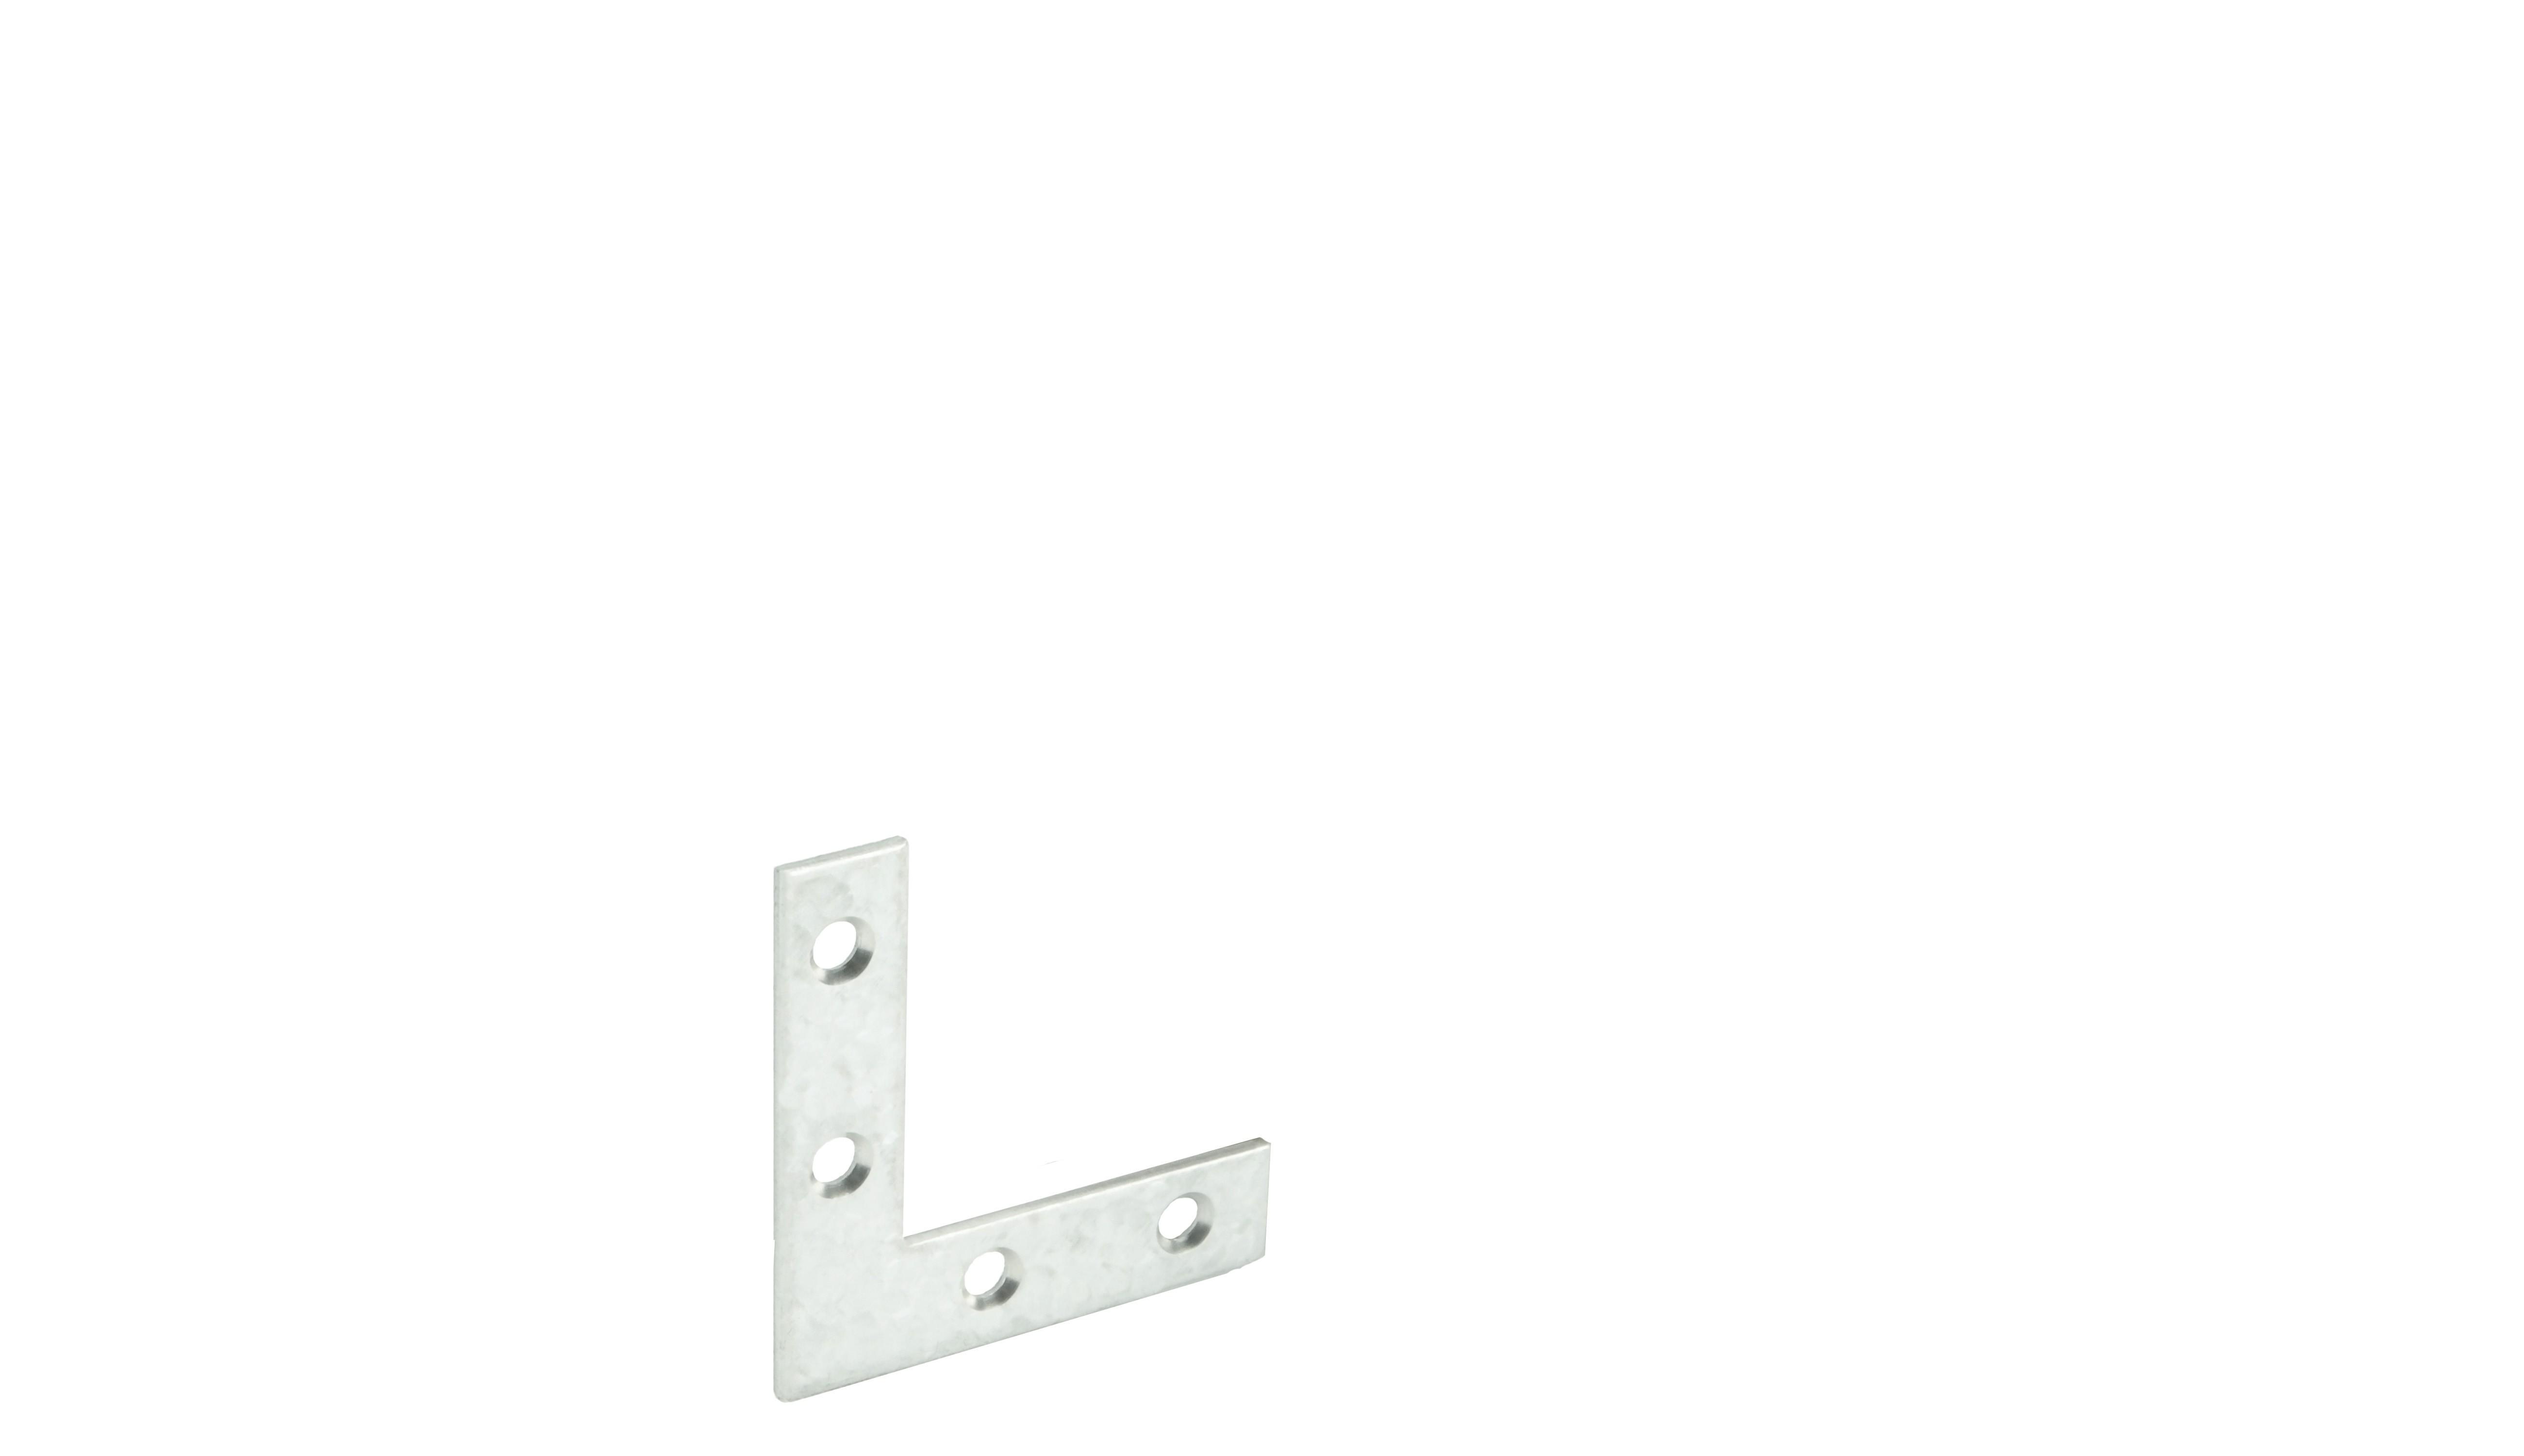 Flat corner iron flat 40x40 10x1,5 GA